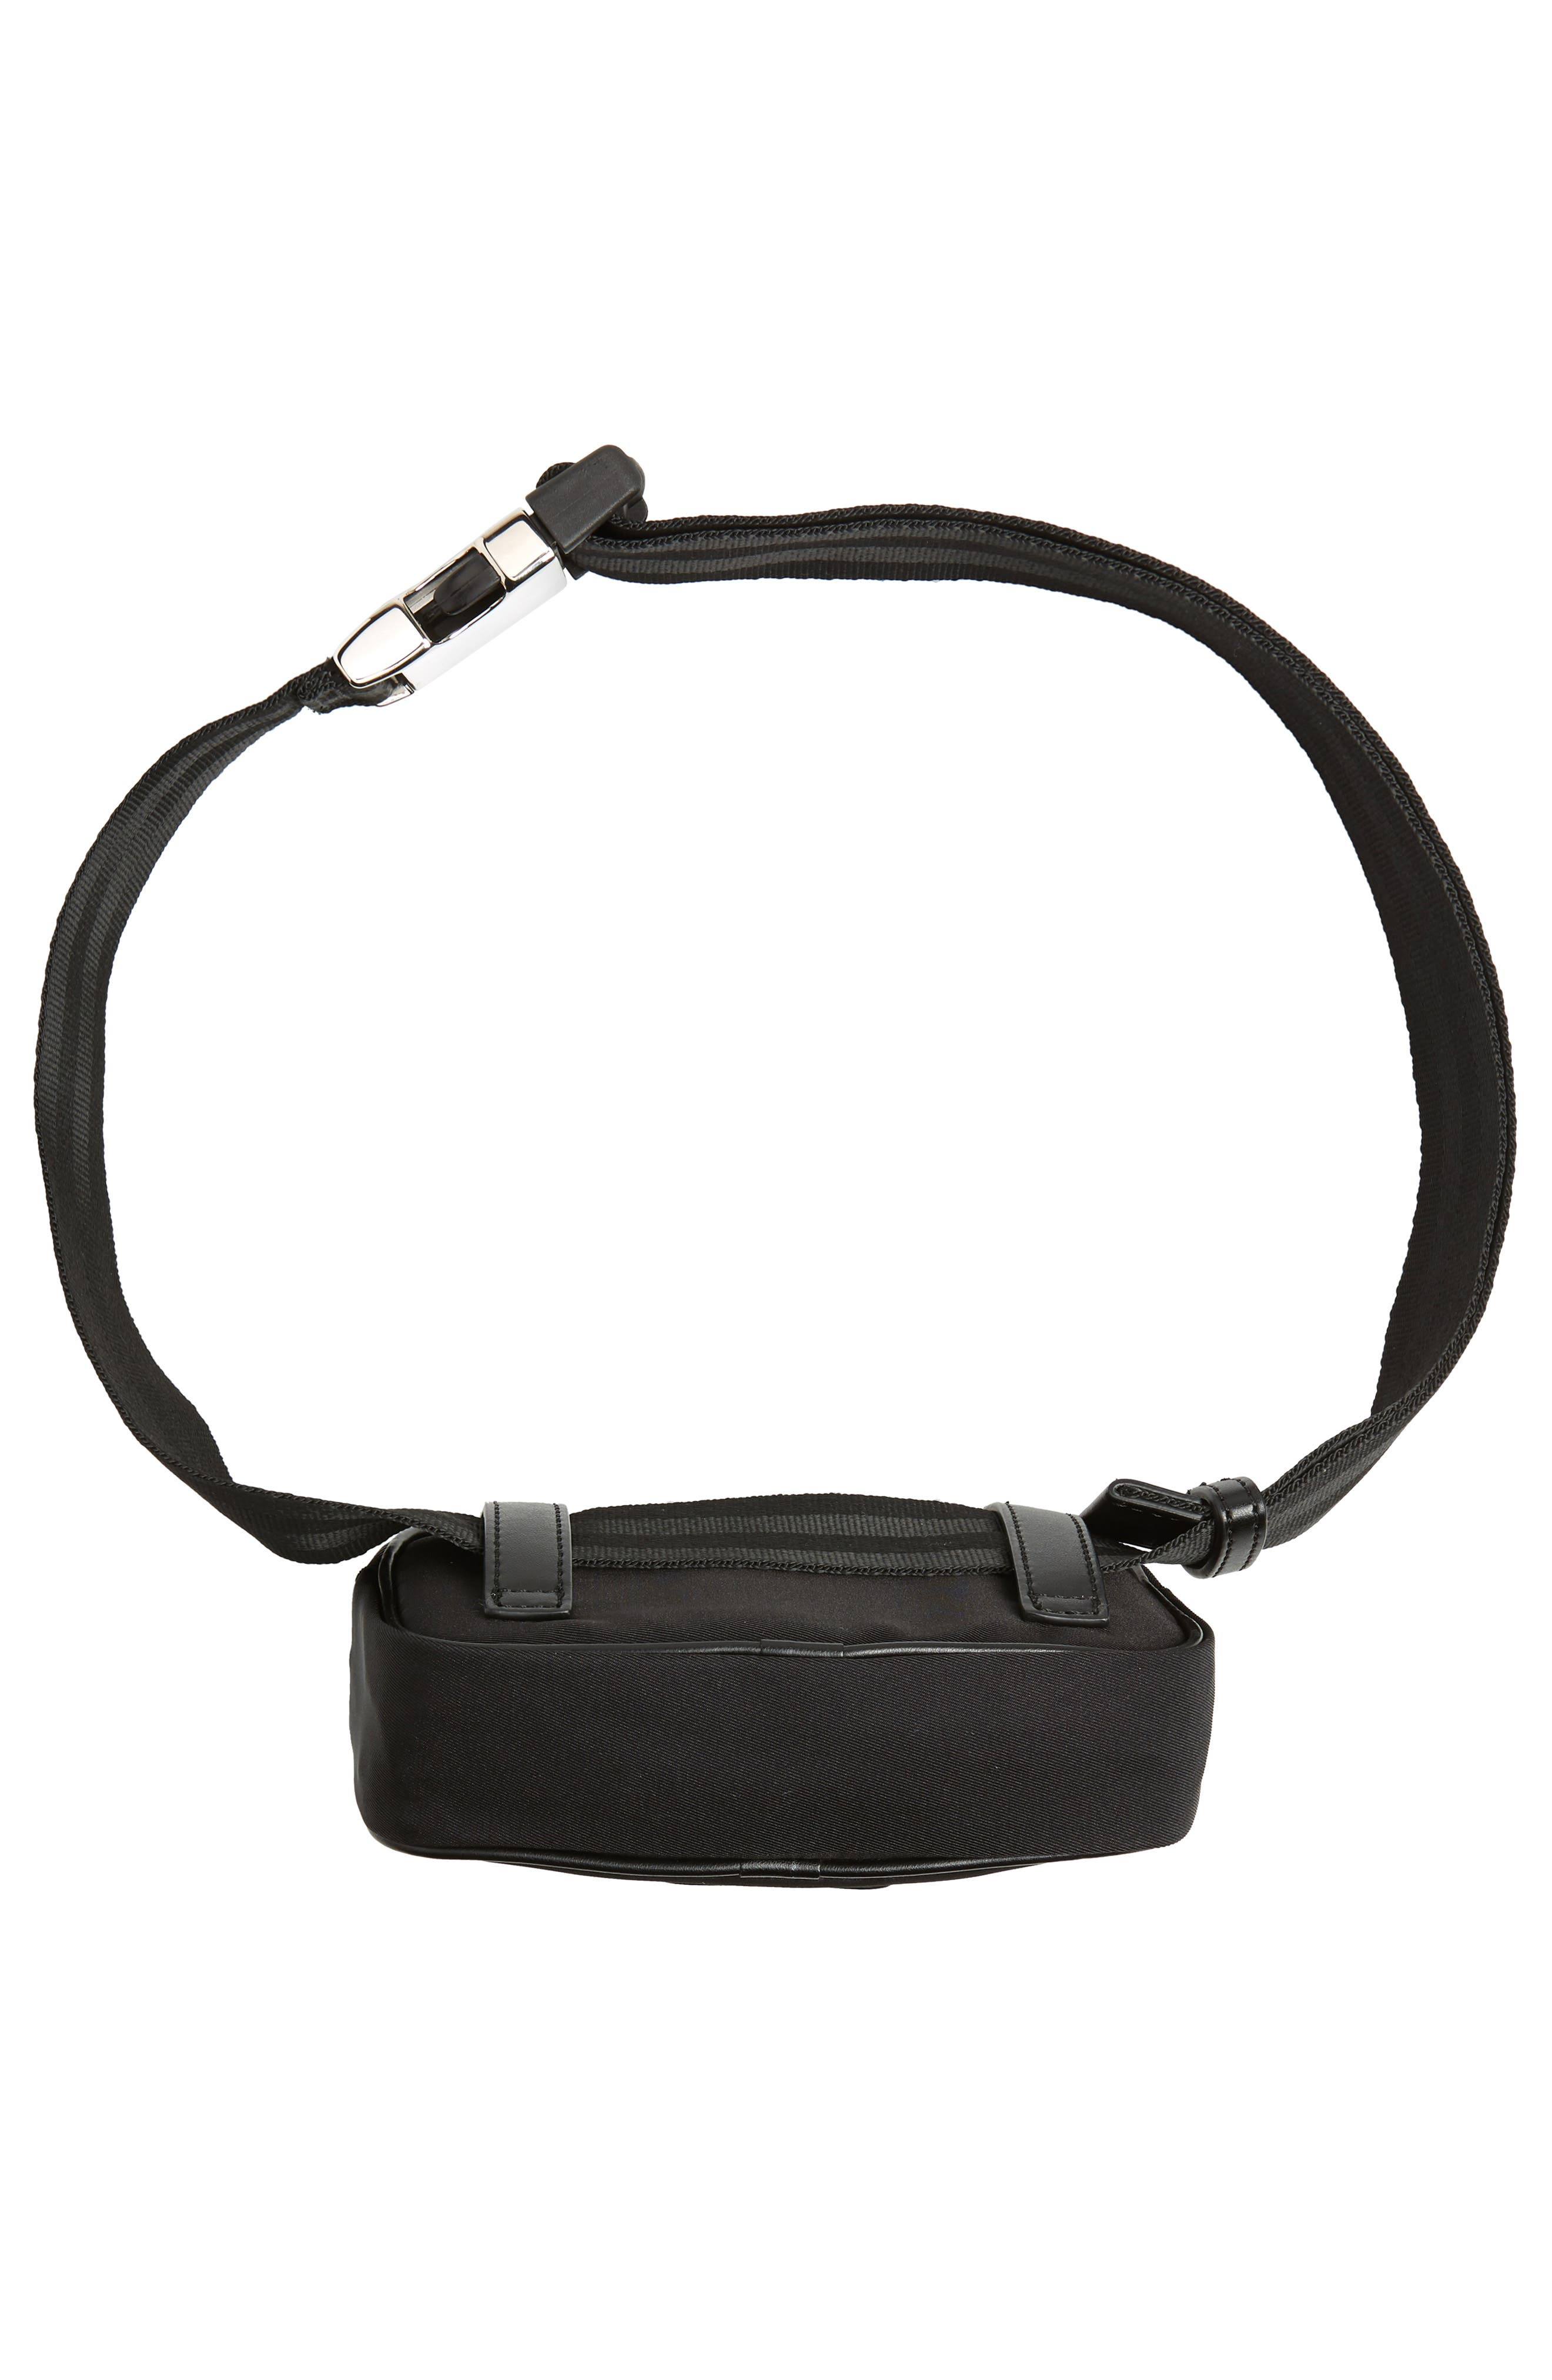 Nylon Convertible Belt Bag,                             Alternate thumbnail 7, color,                             BLACK/ SILVER